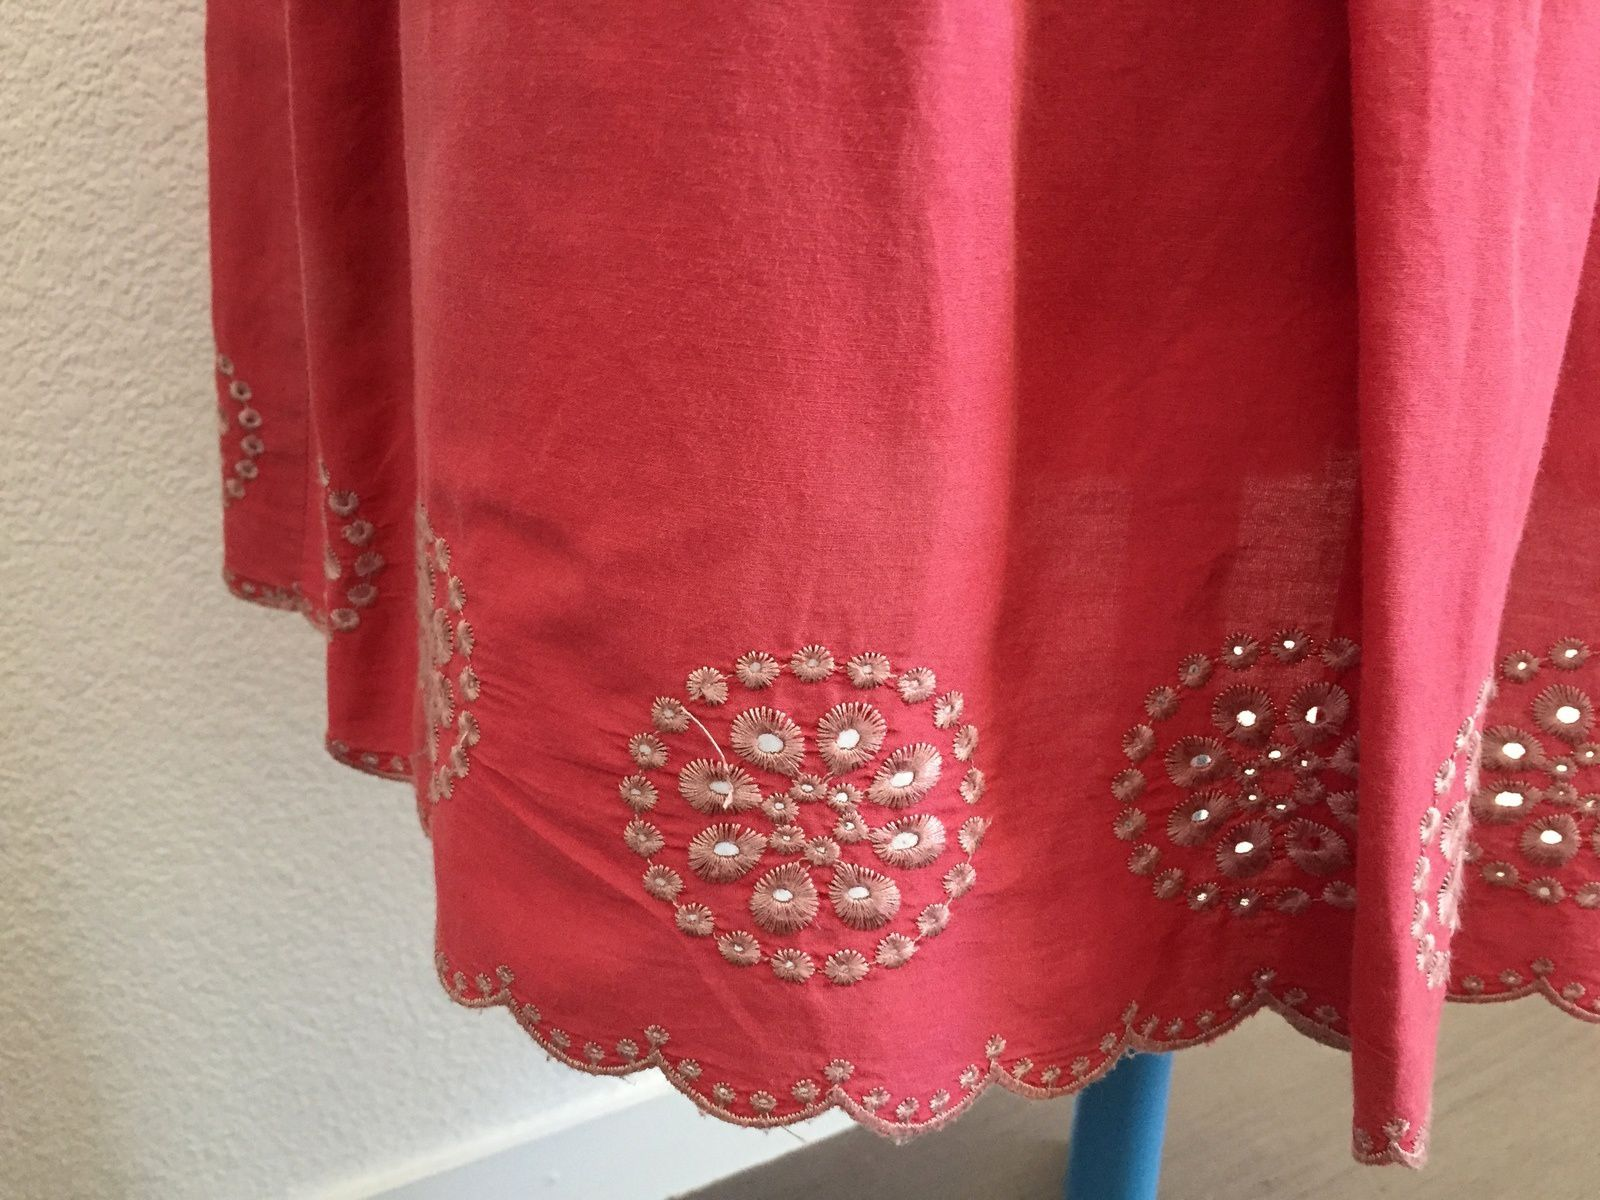 Jupe rose  soft grey soie et coton, brodée, sur charlotteblablablog